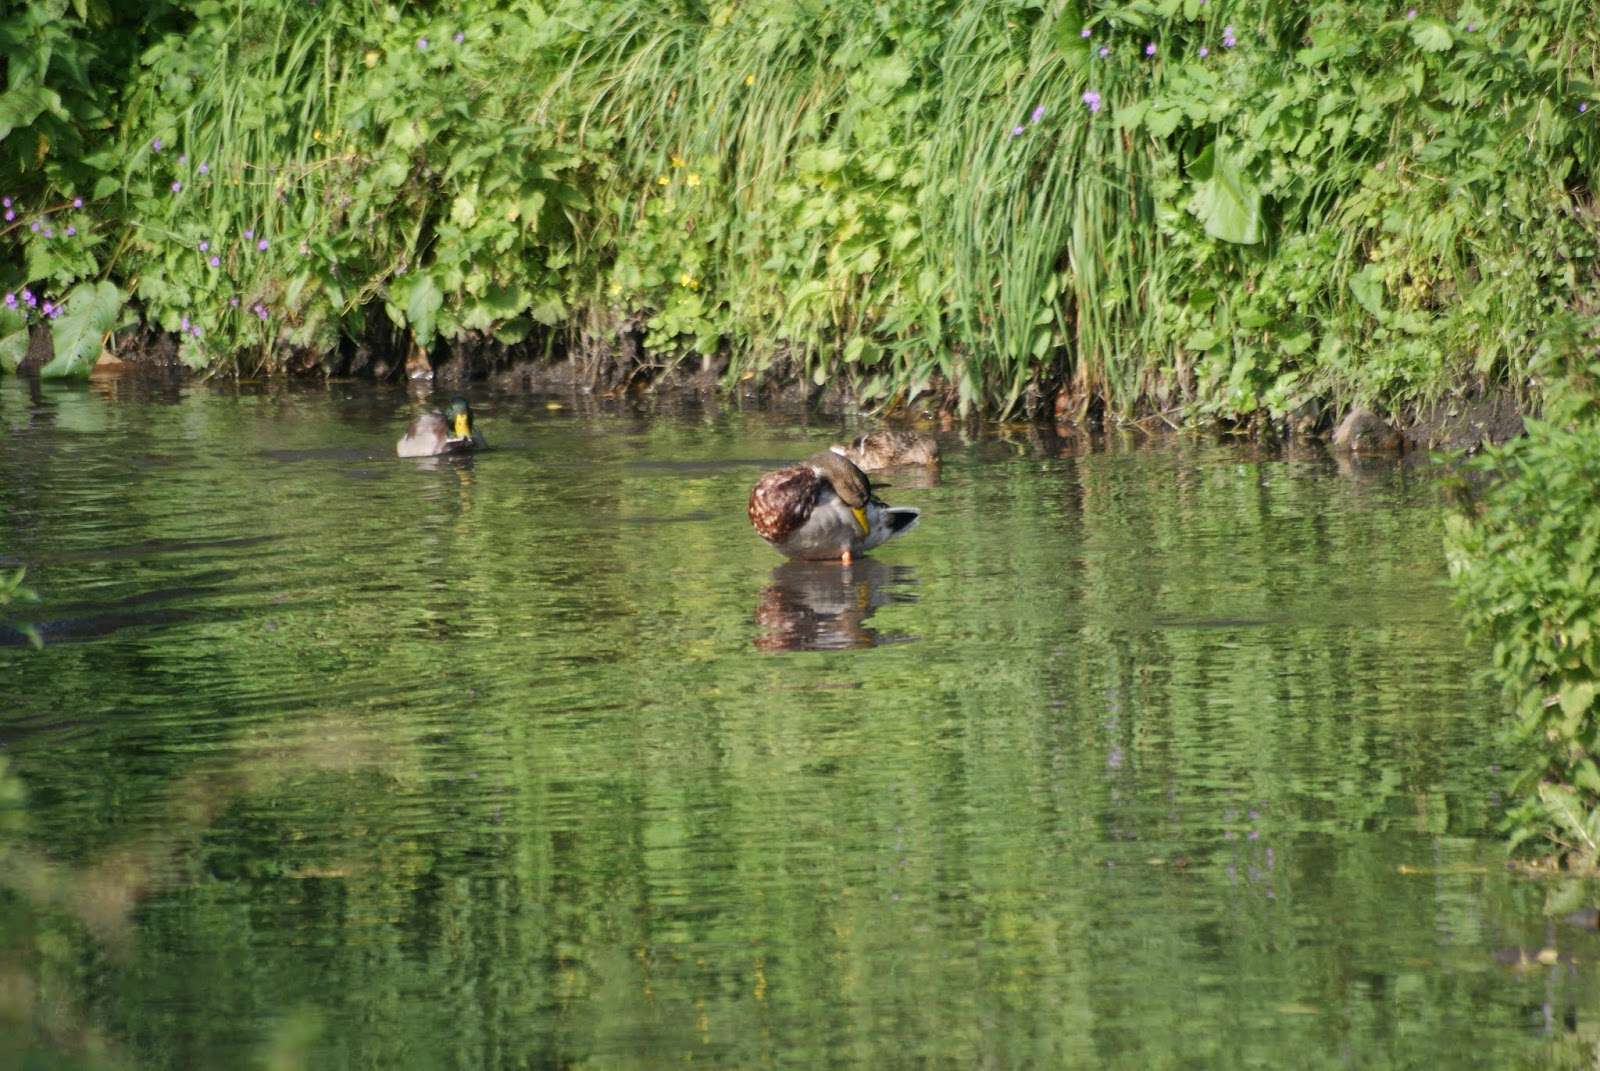 kaczka duck in river